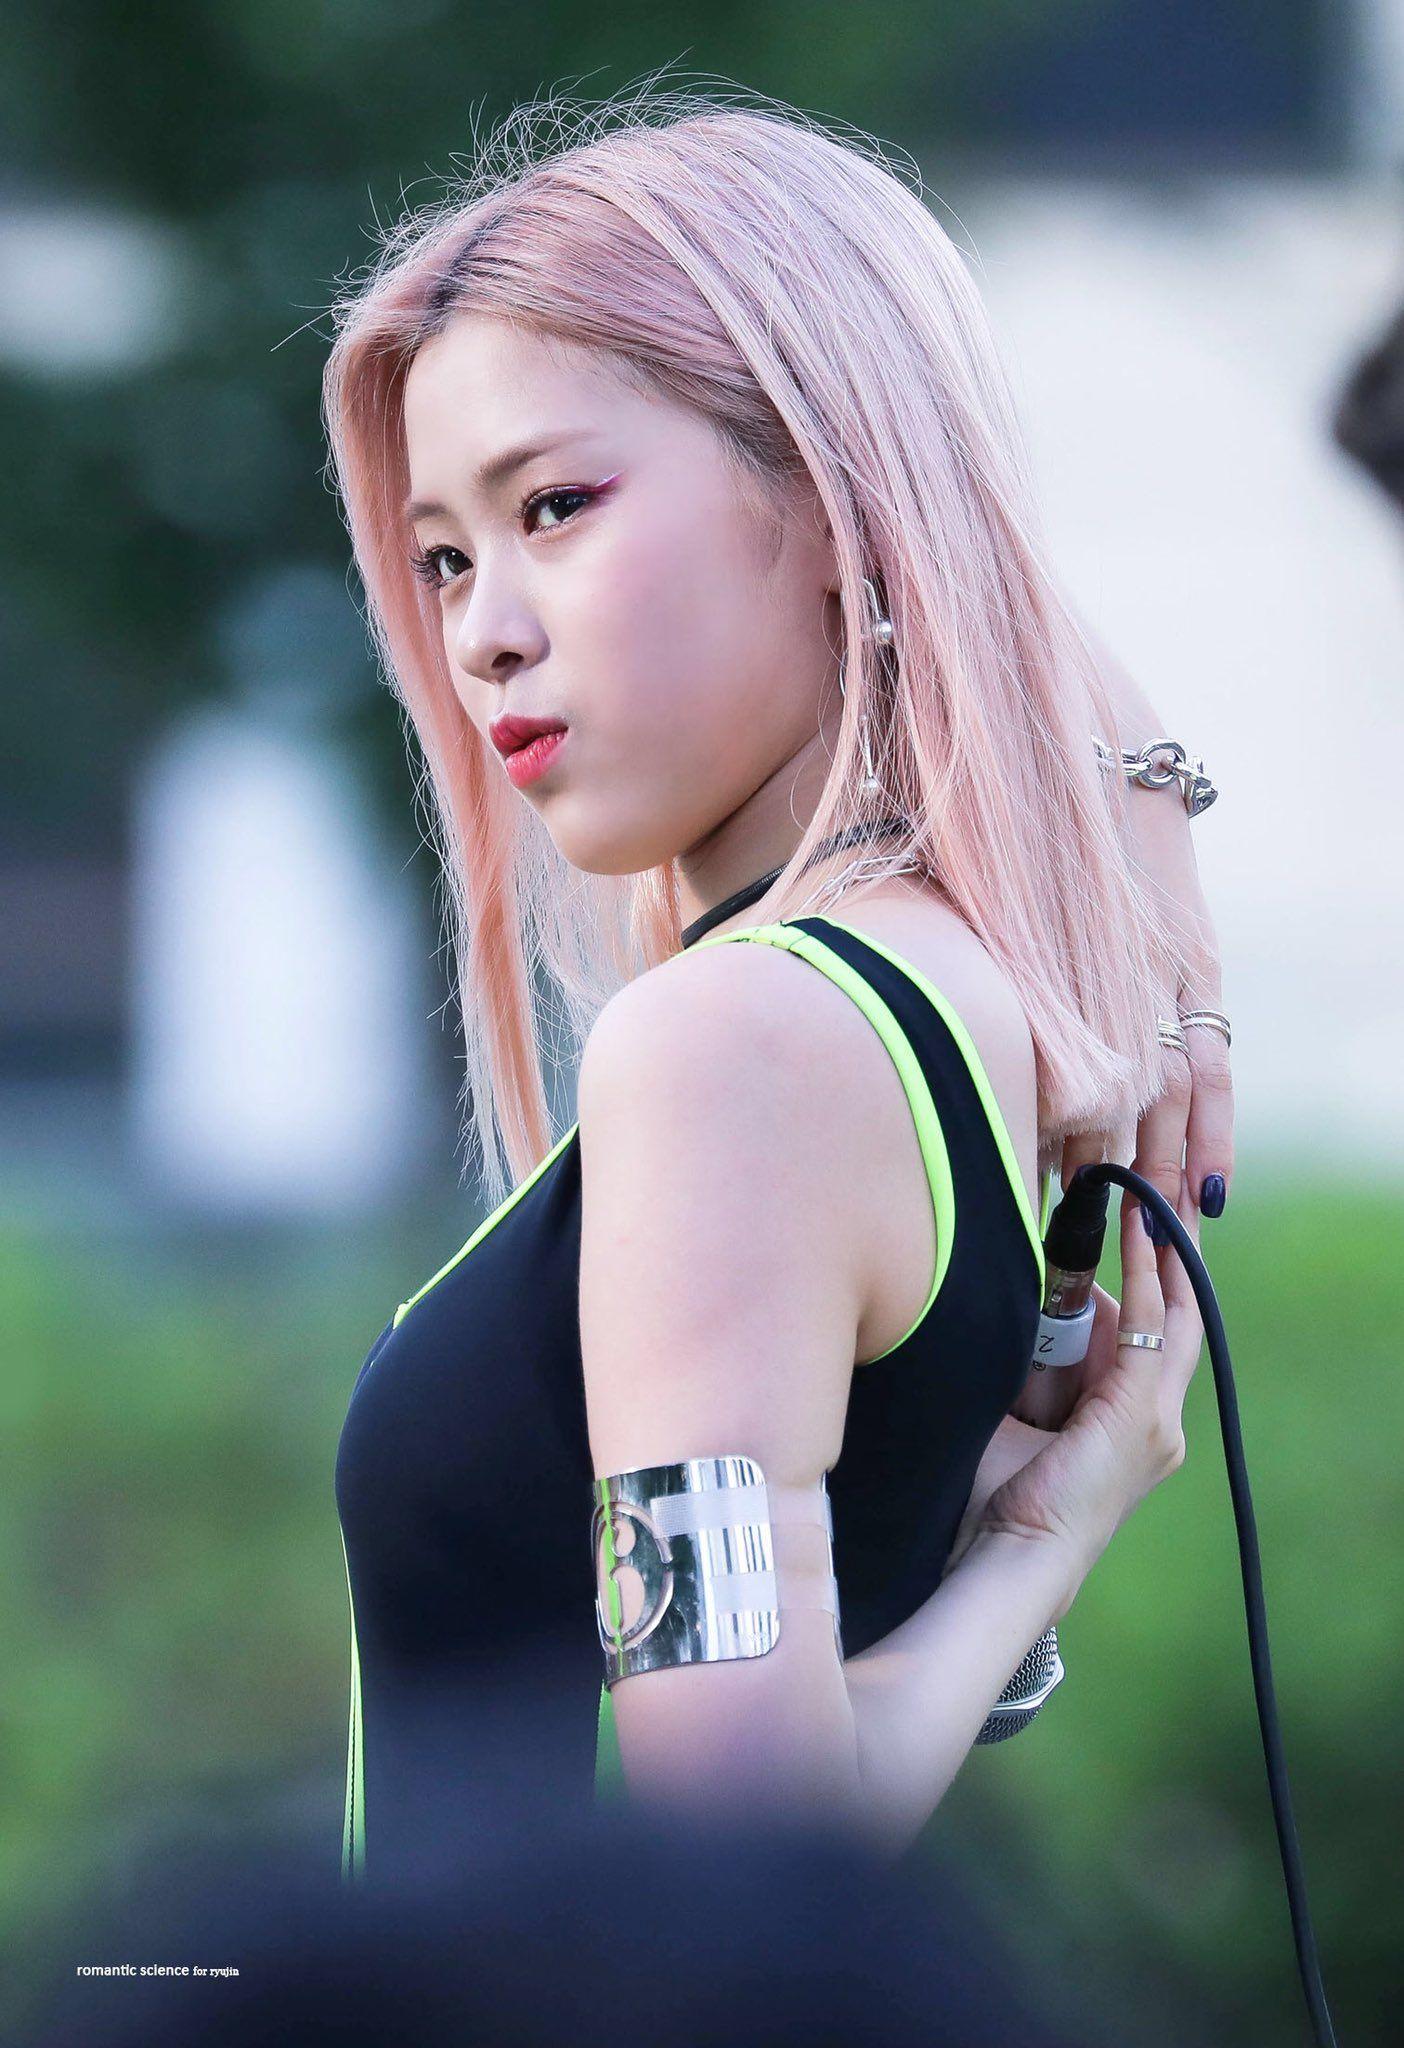 Romantic Science On Twitter Itzy Celebrities Kpop Girls